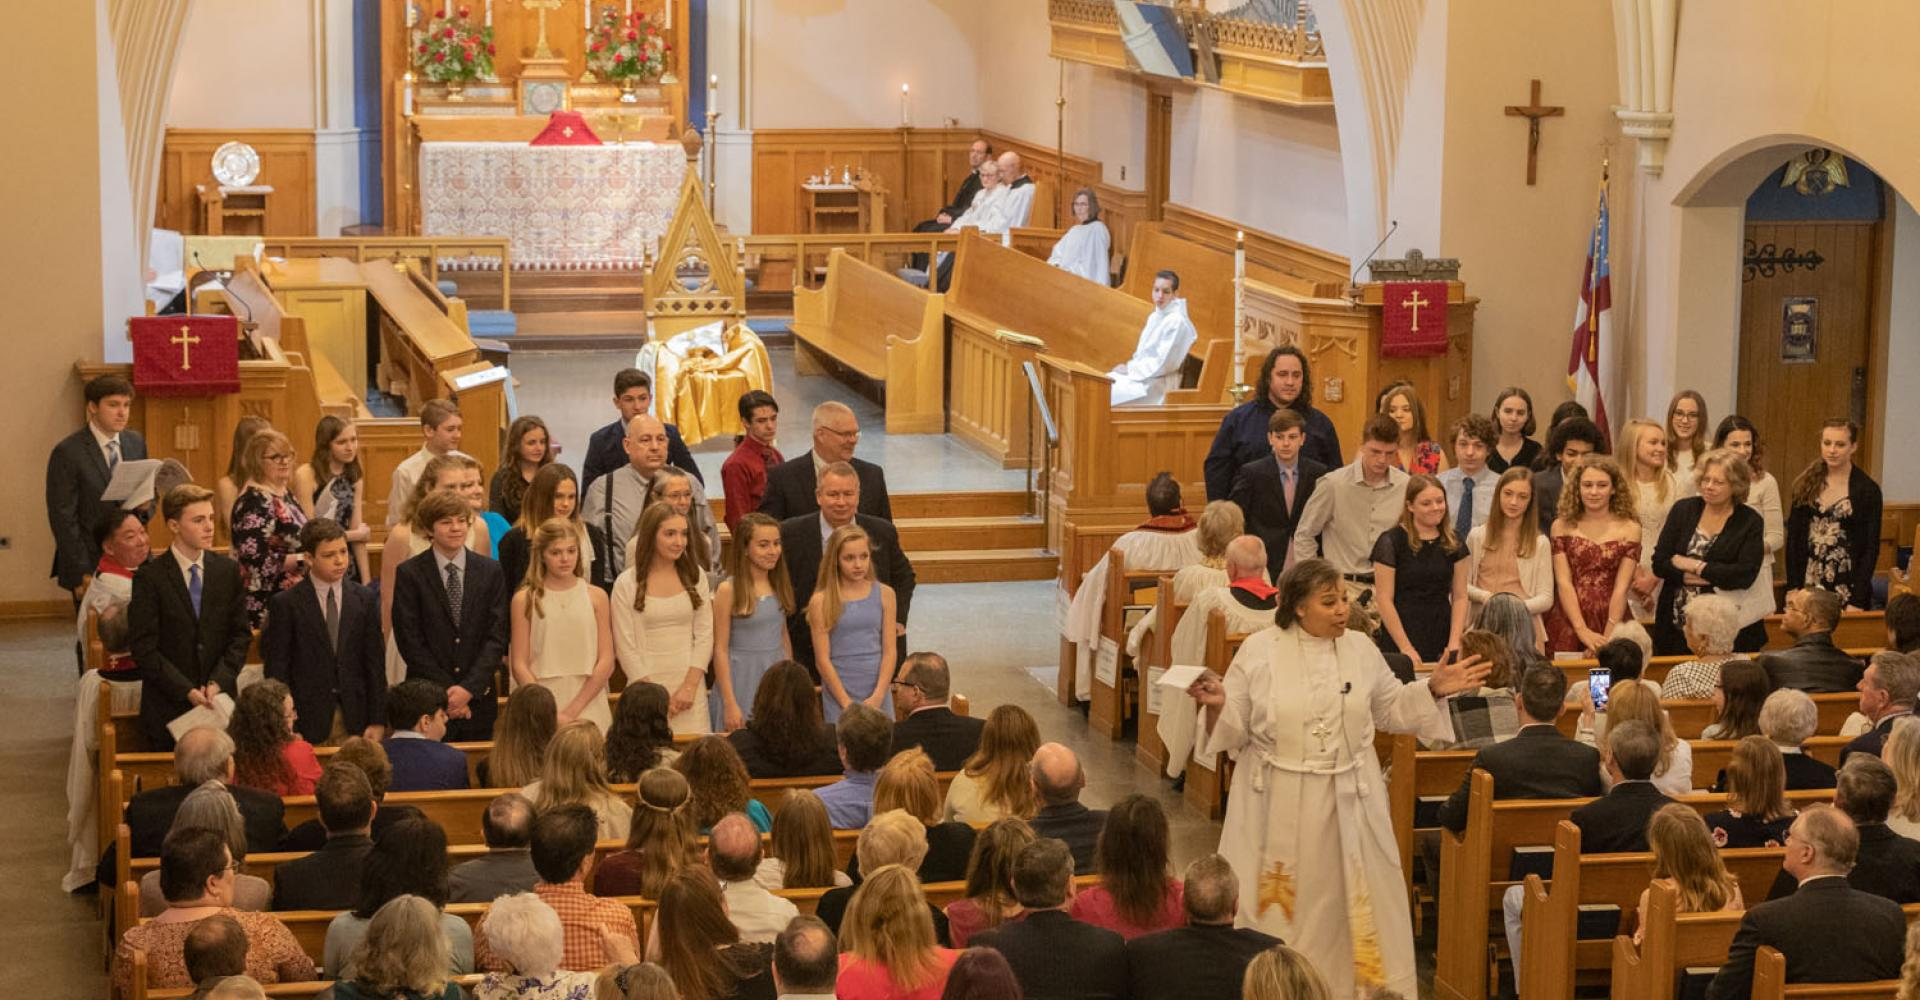 Bishop Carlye Hughes preaching at her first Confirmation service. CYNTHIA L. BLACK PHOTO